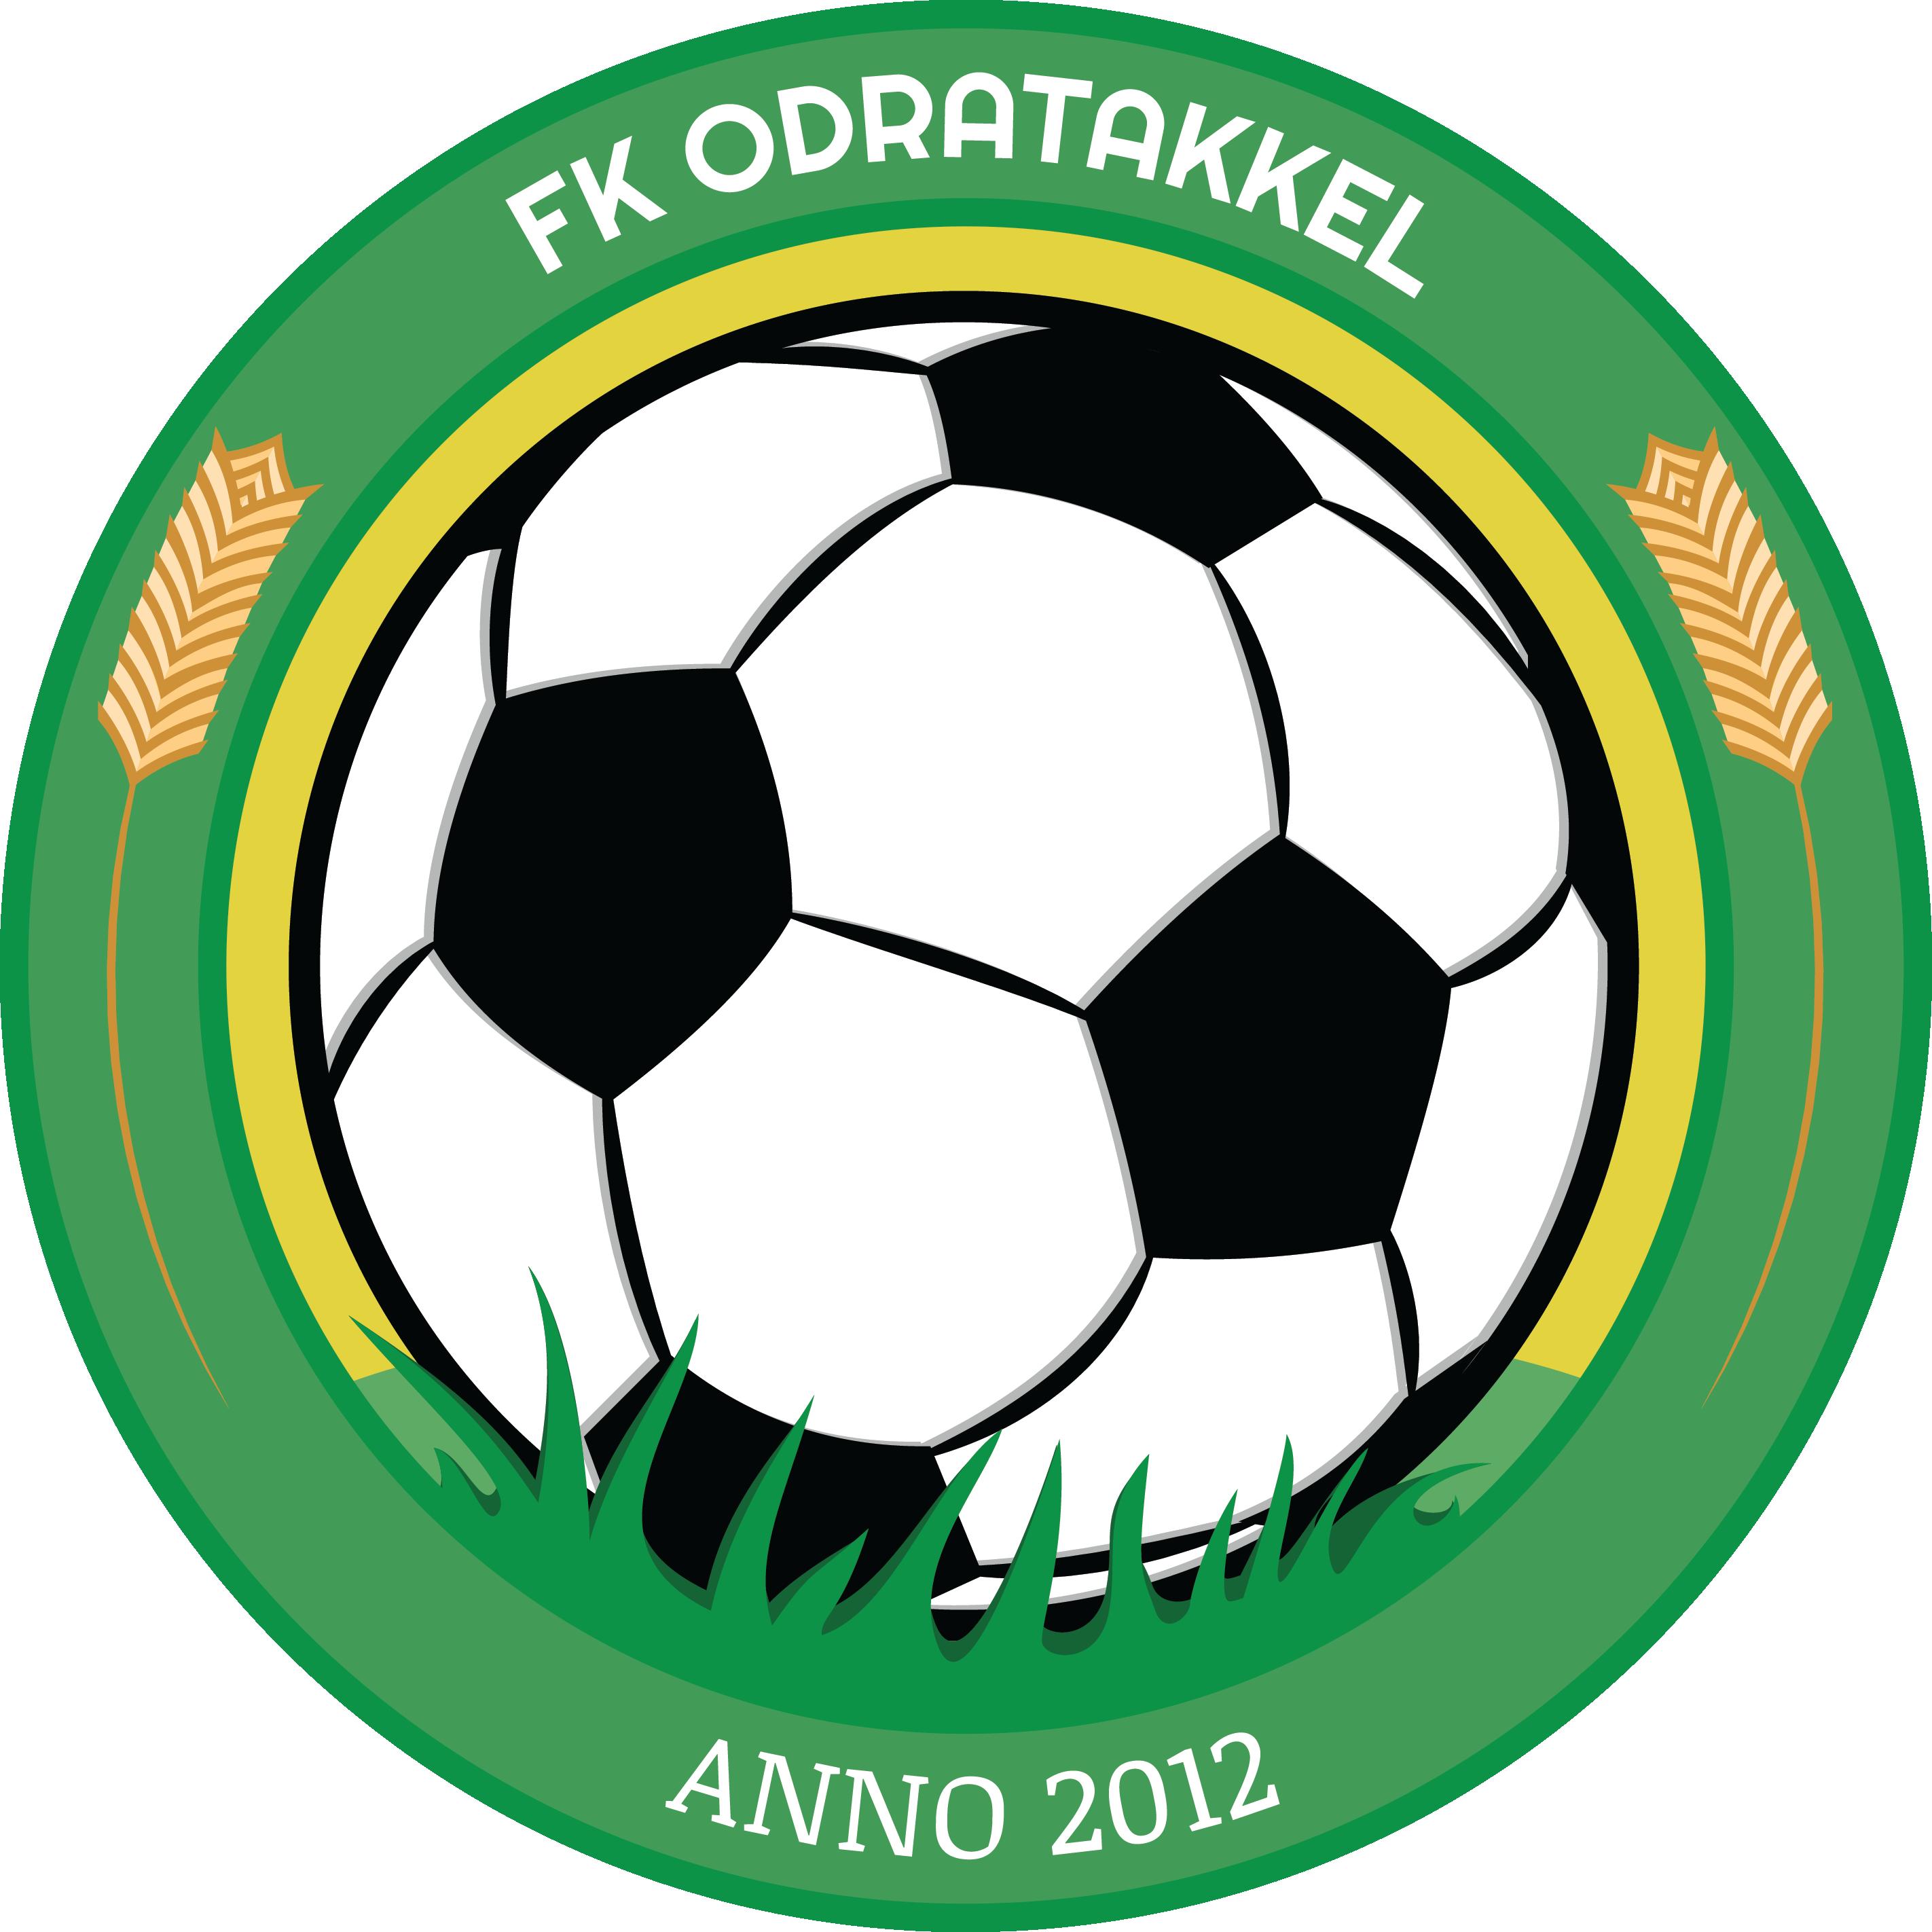 RL. FK Odratakkel